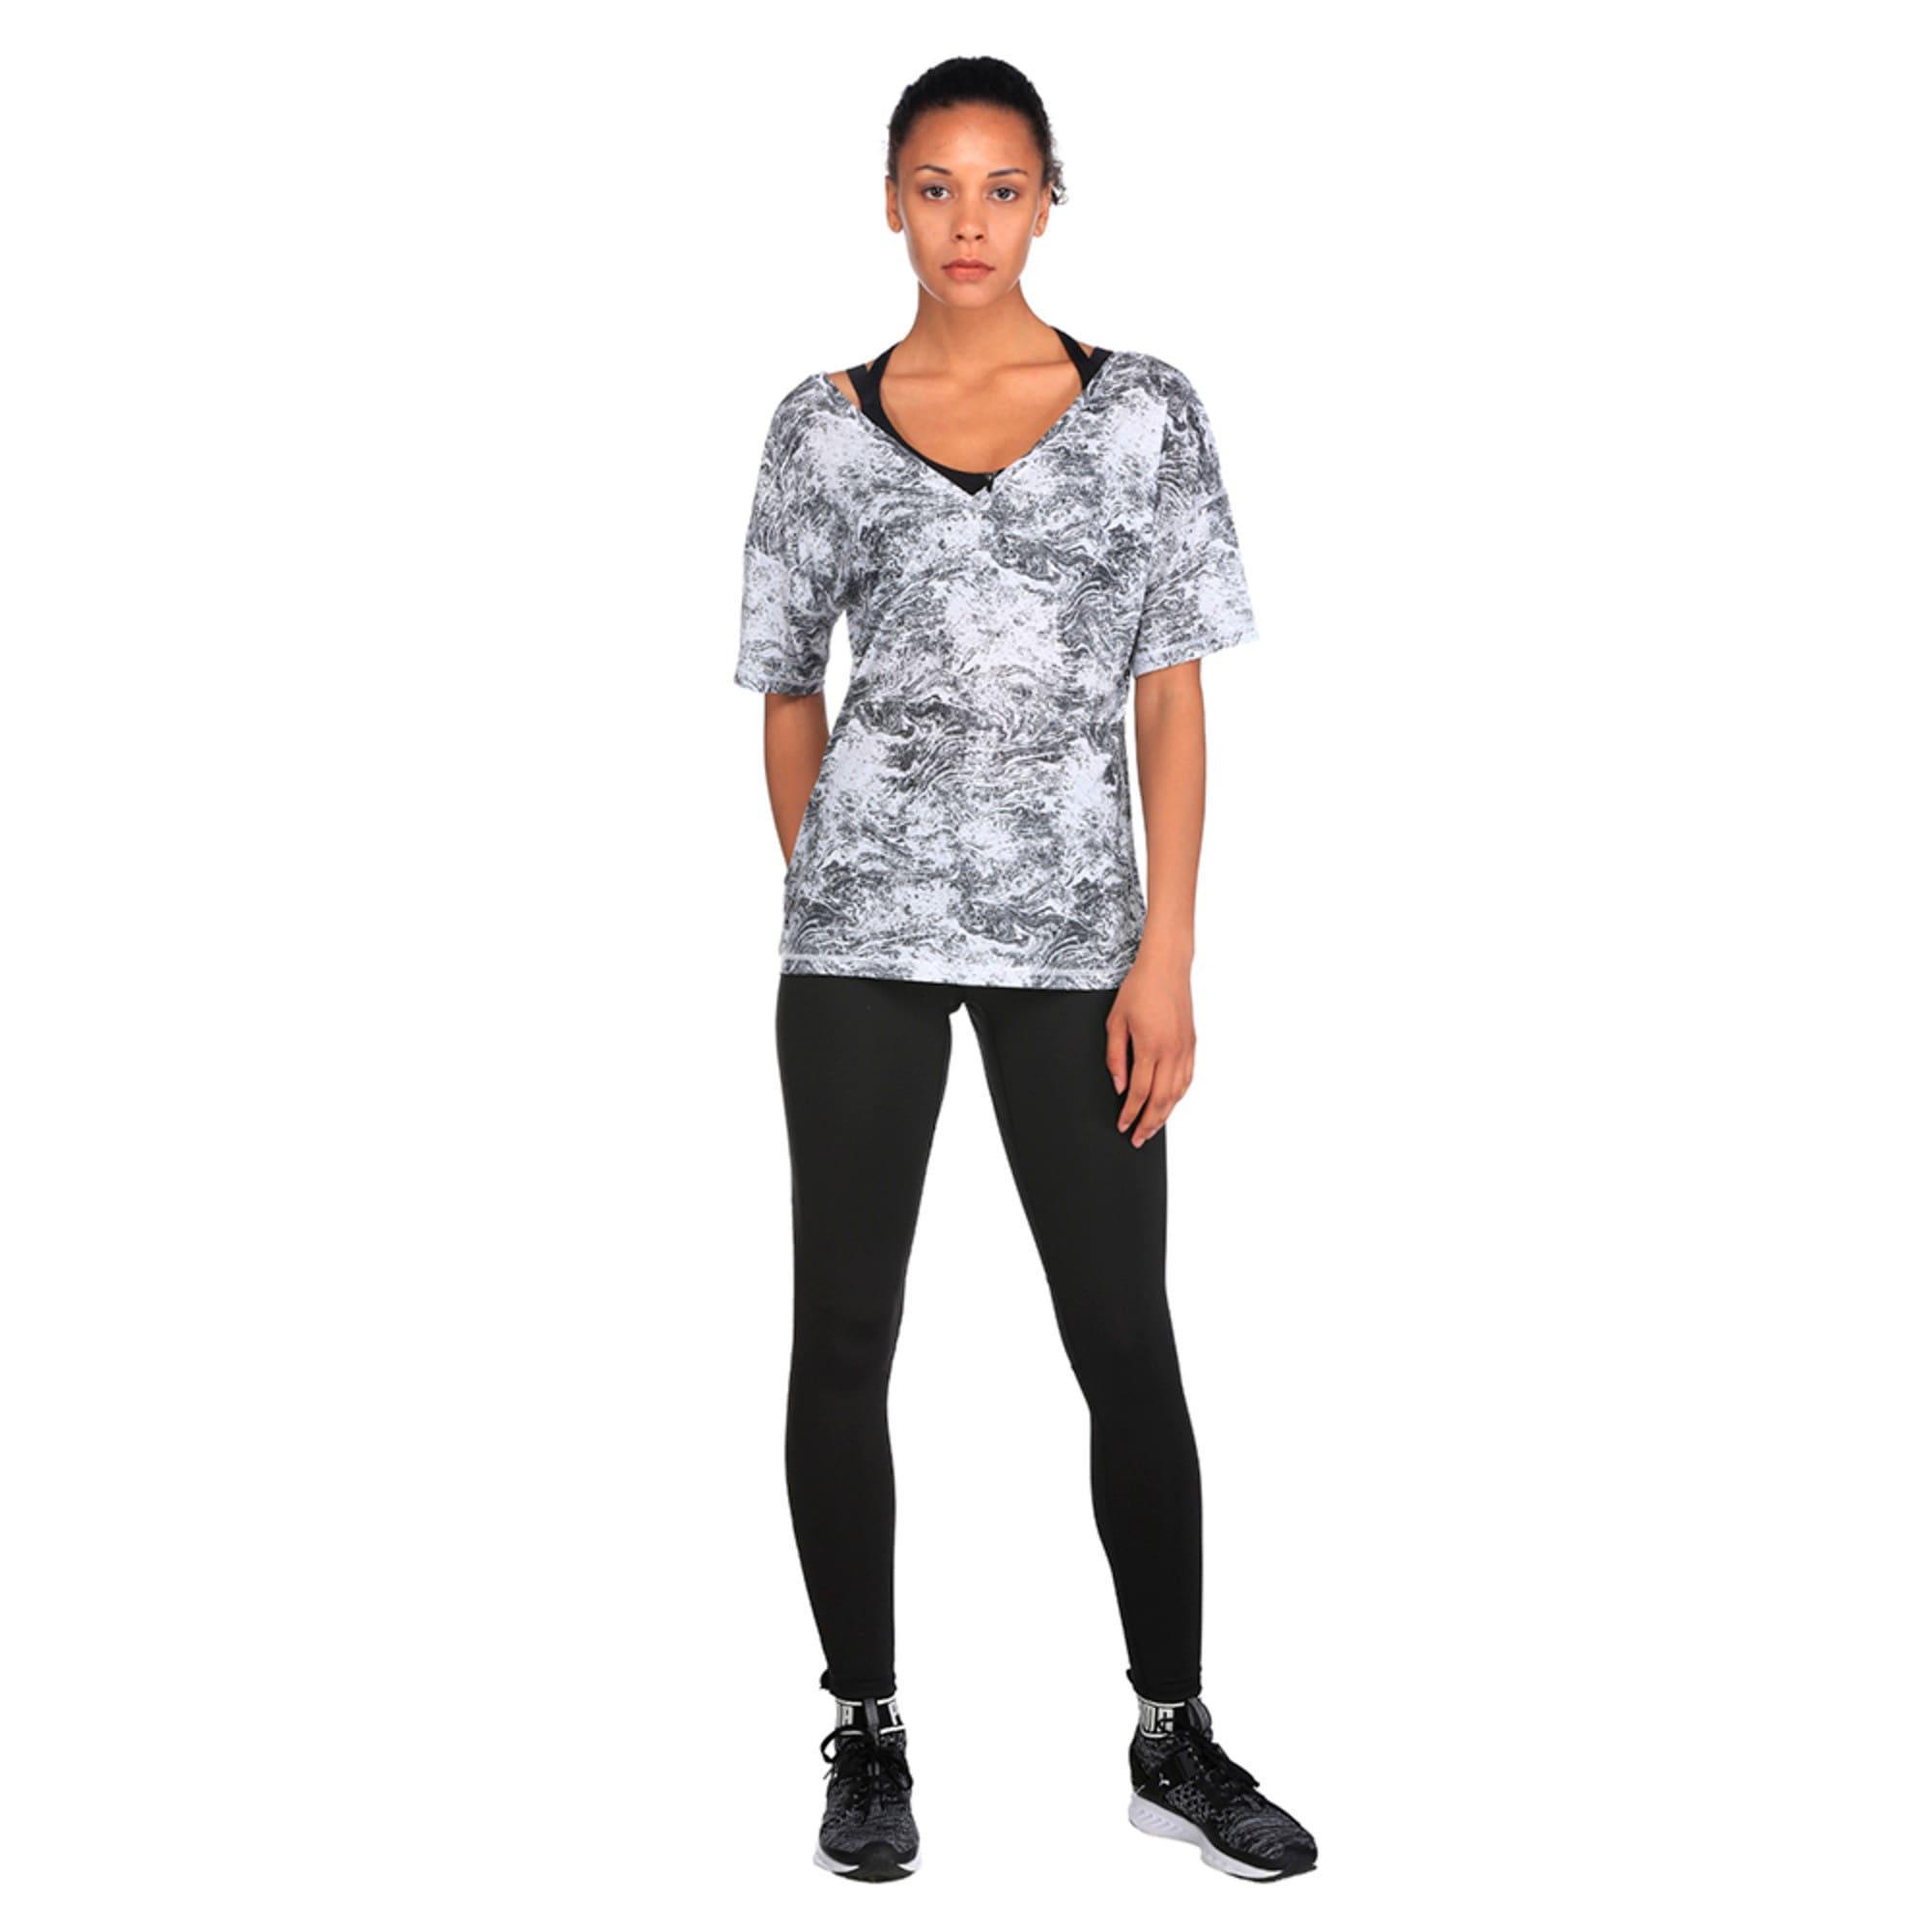 Thumbnail 4 of Active Training Women's Dancer Drapey T-Shirt, -white black nature prt, medium-IND